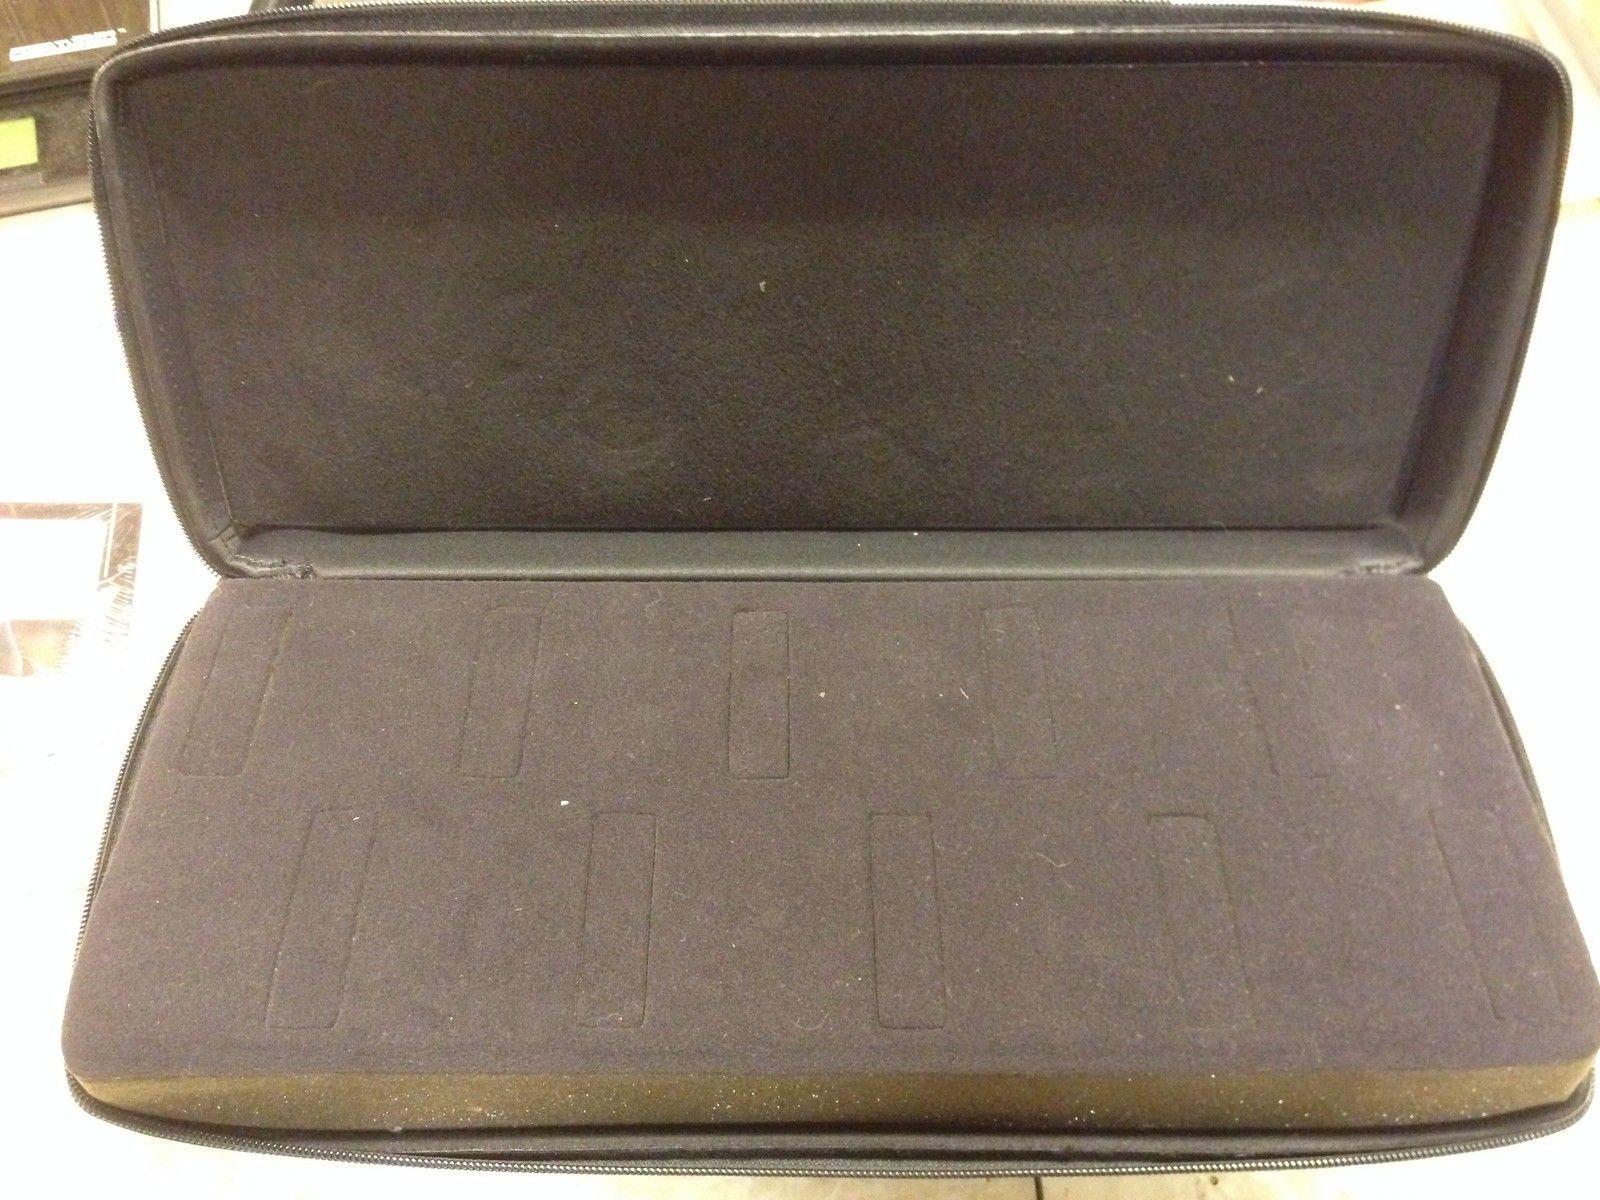 Oakley Sales Rep Case - v3ndWai.jpg